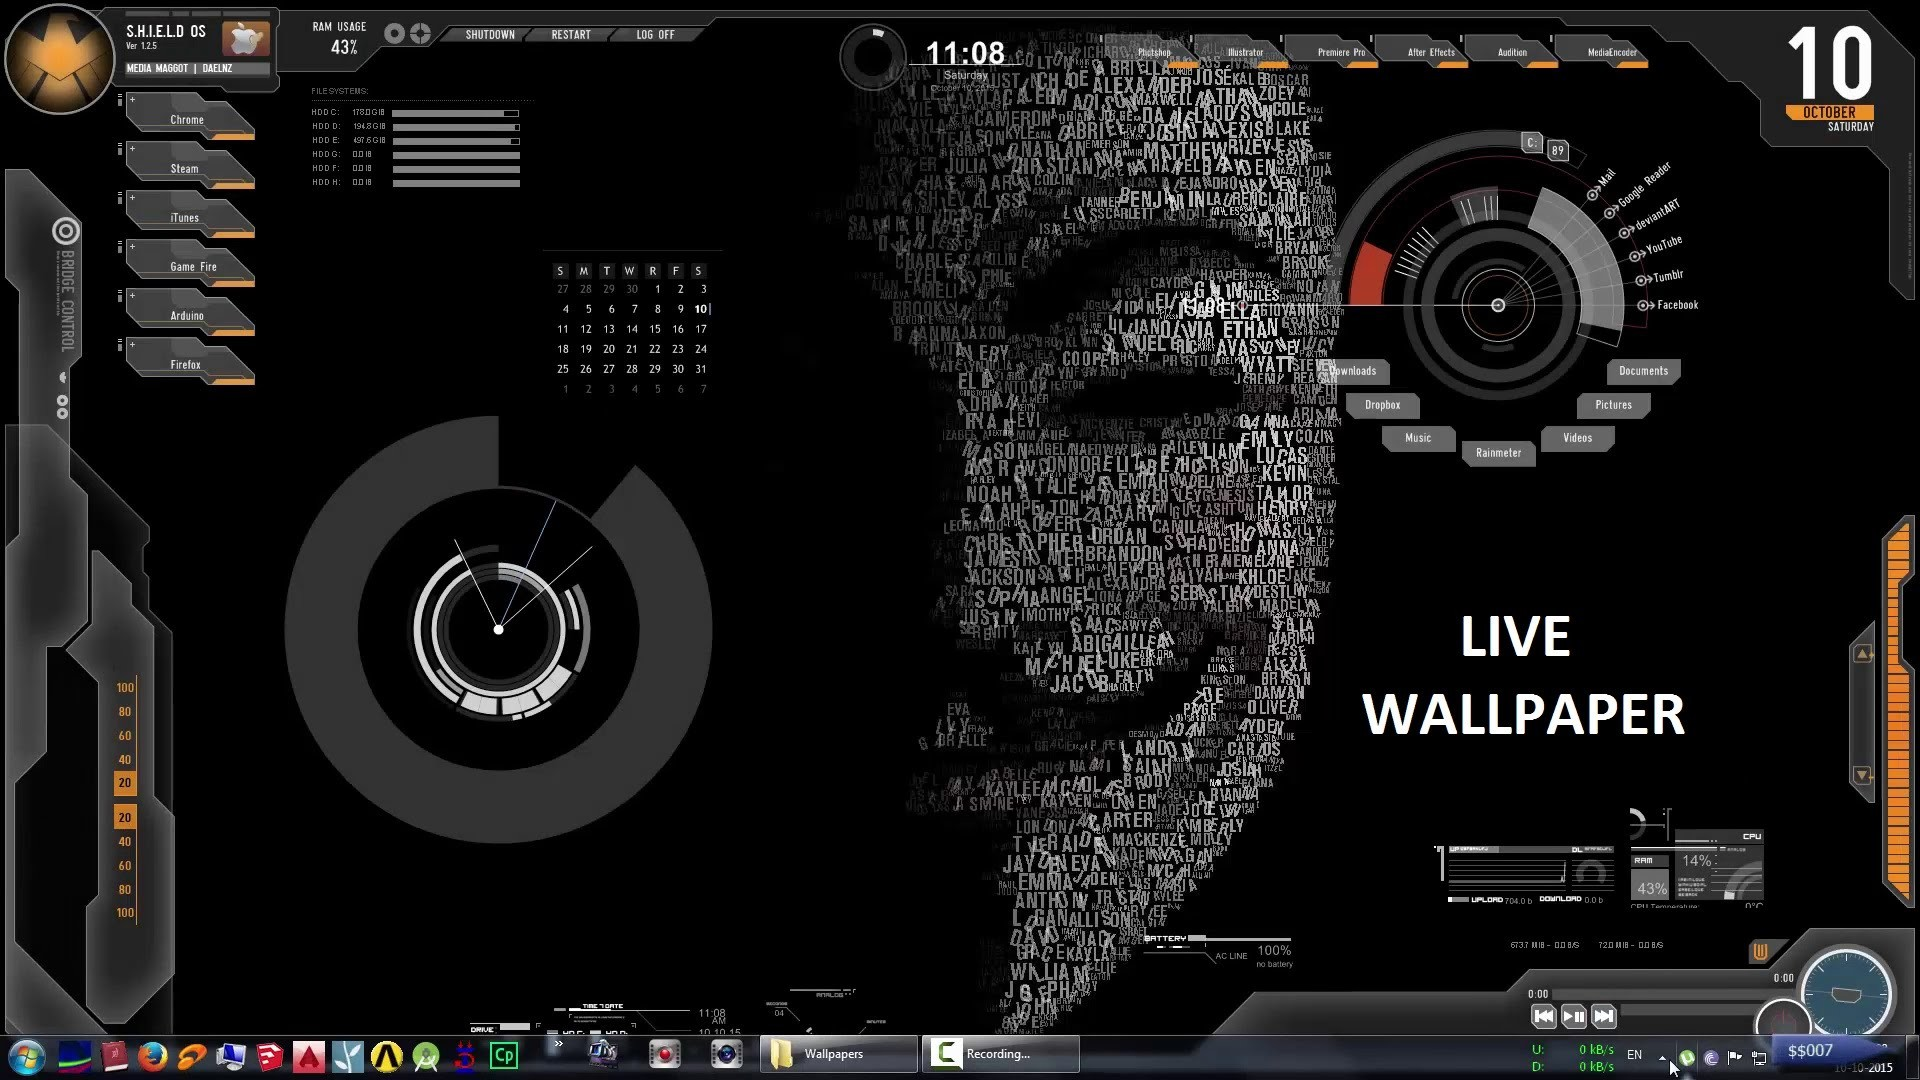 Make your desktop ALIVE with LIVE WALLPAPER – Rainmeter   $$007 – YouTube